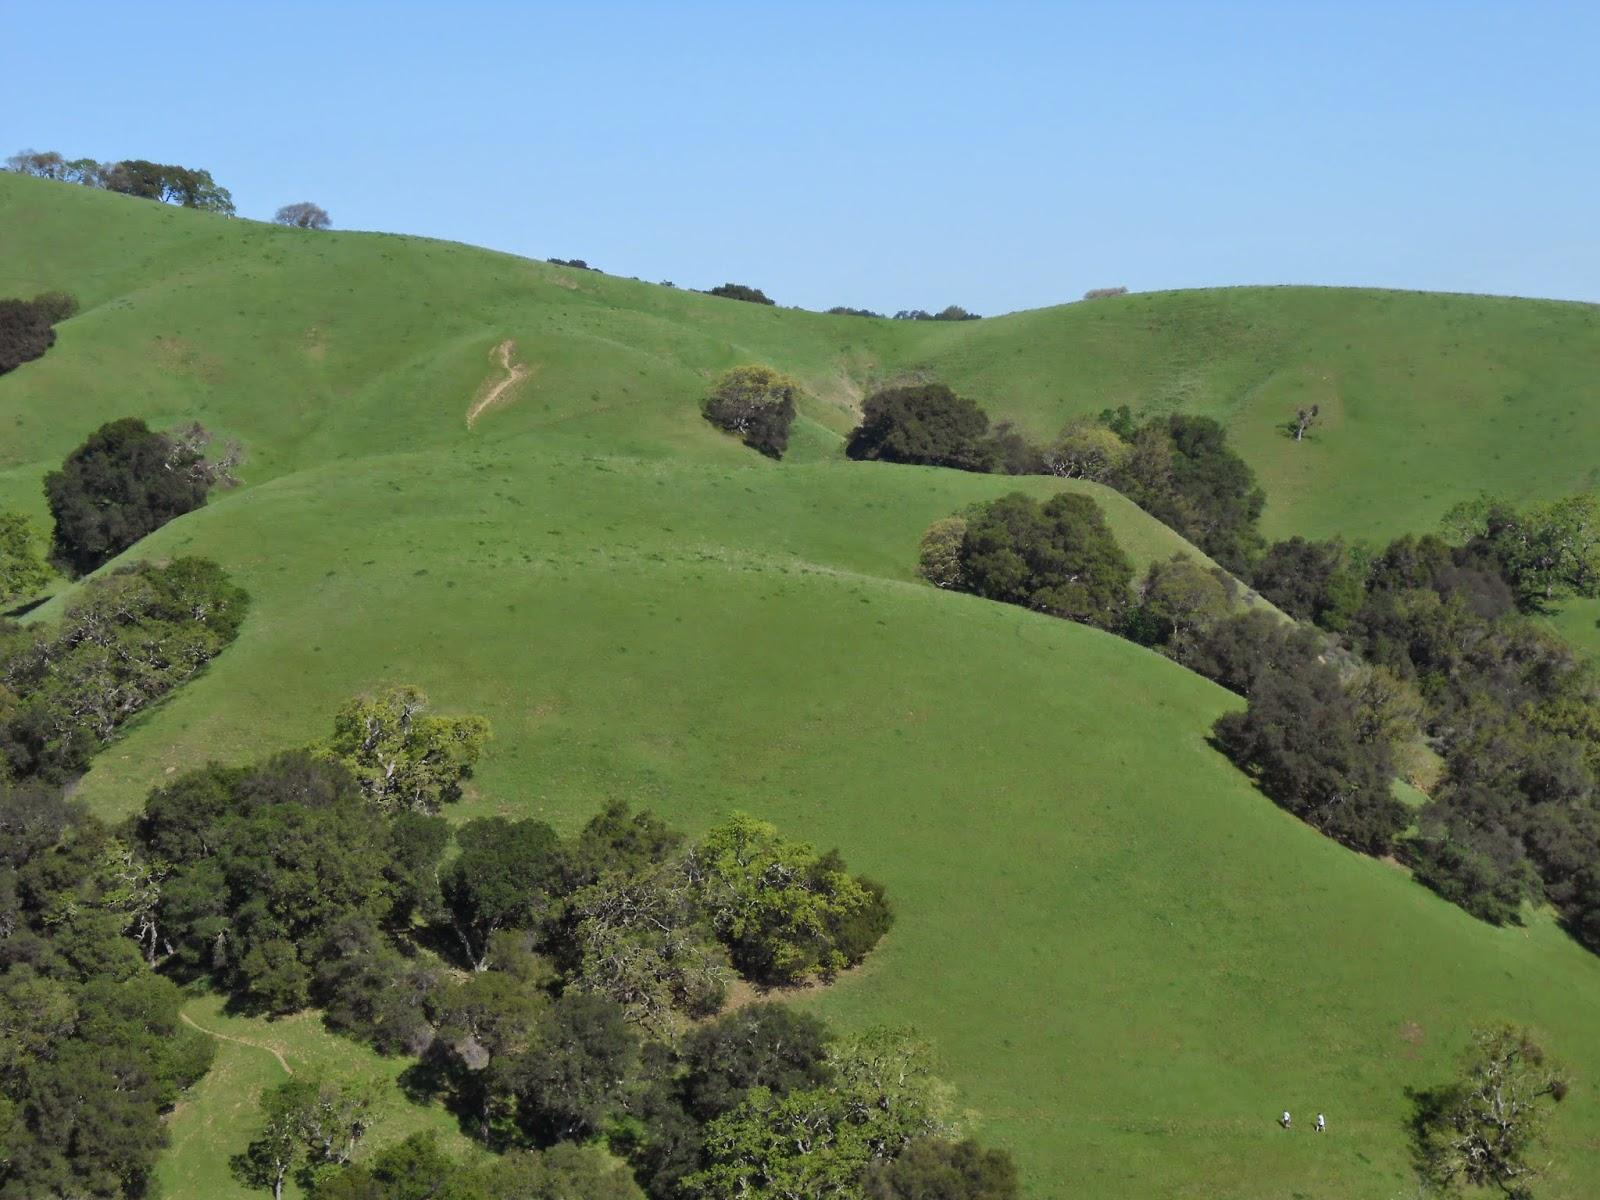 spring, hills, spiritual nature